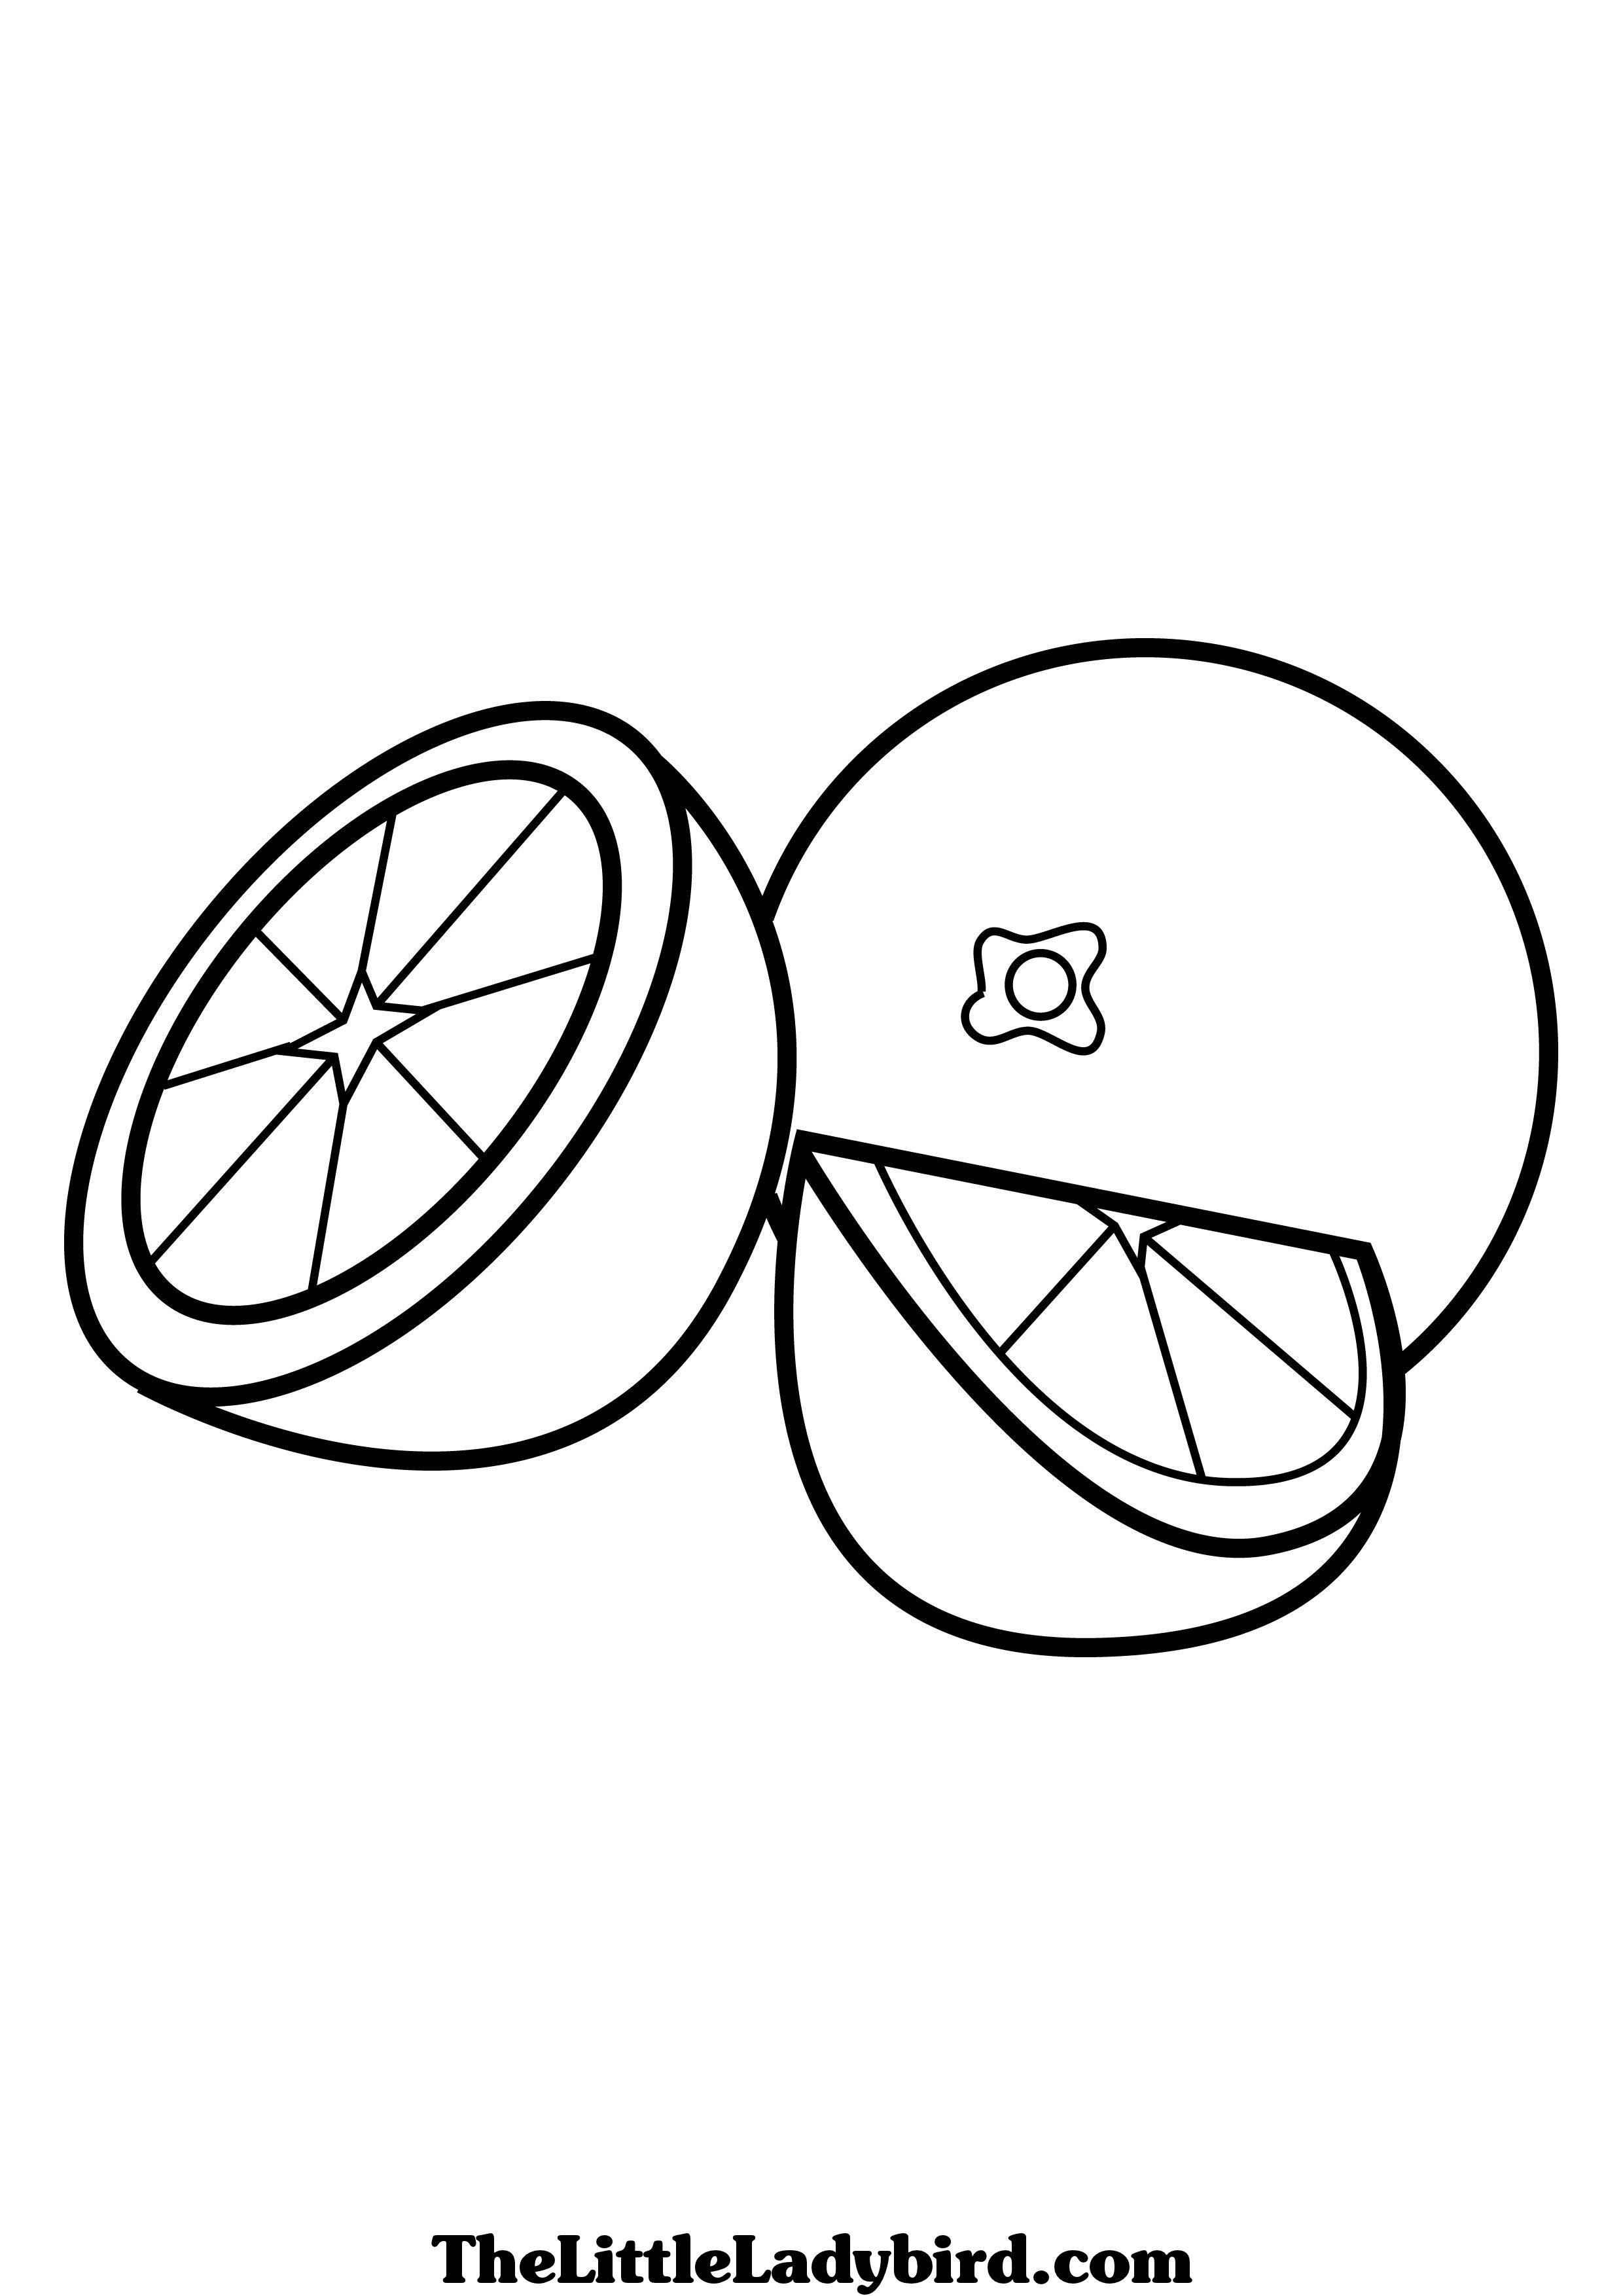 grapefruit color sheet - Google Search | Texas project | Pinterest